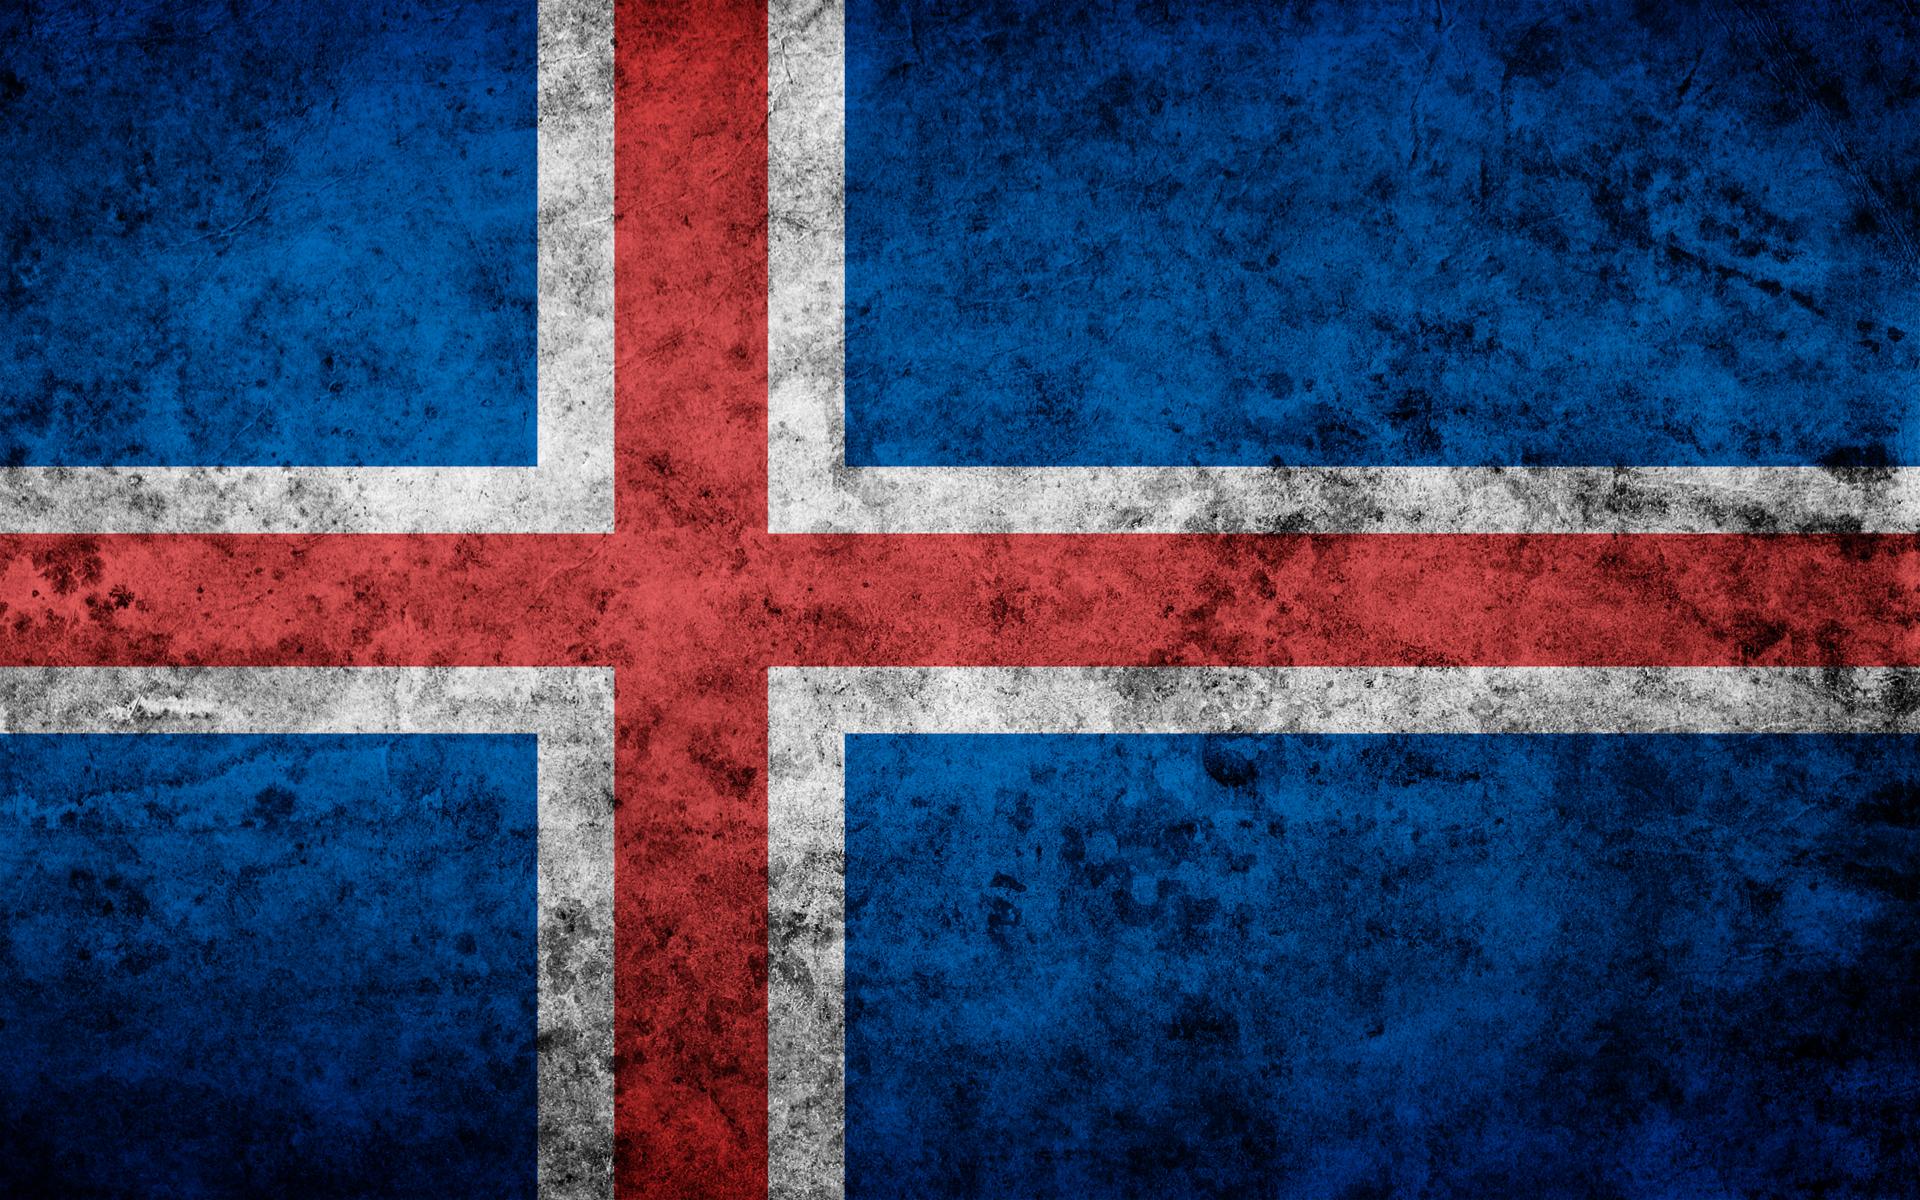 Iceland grunge flag wallpaper | 1920x1200 | 5291 | WallpaperUP